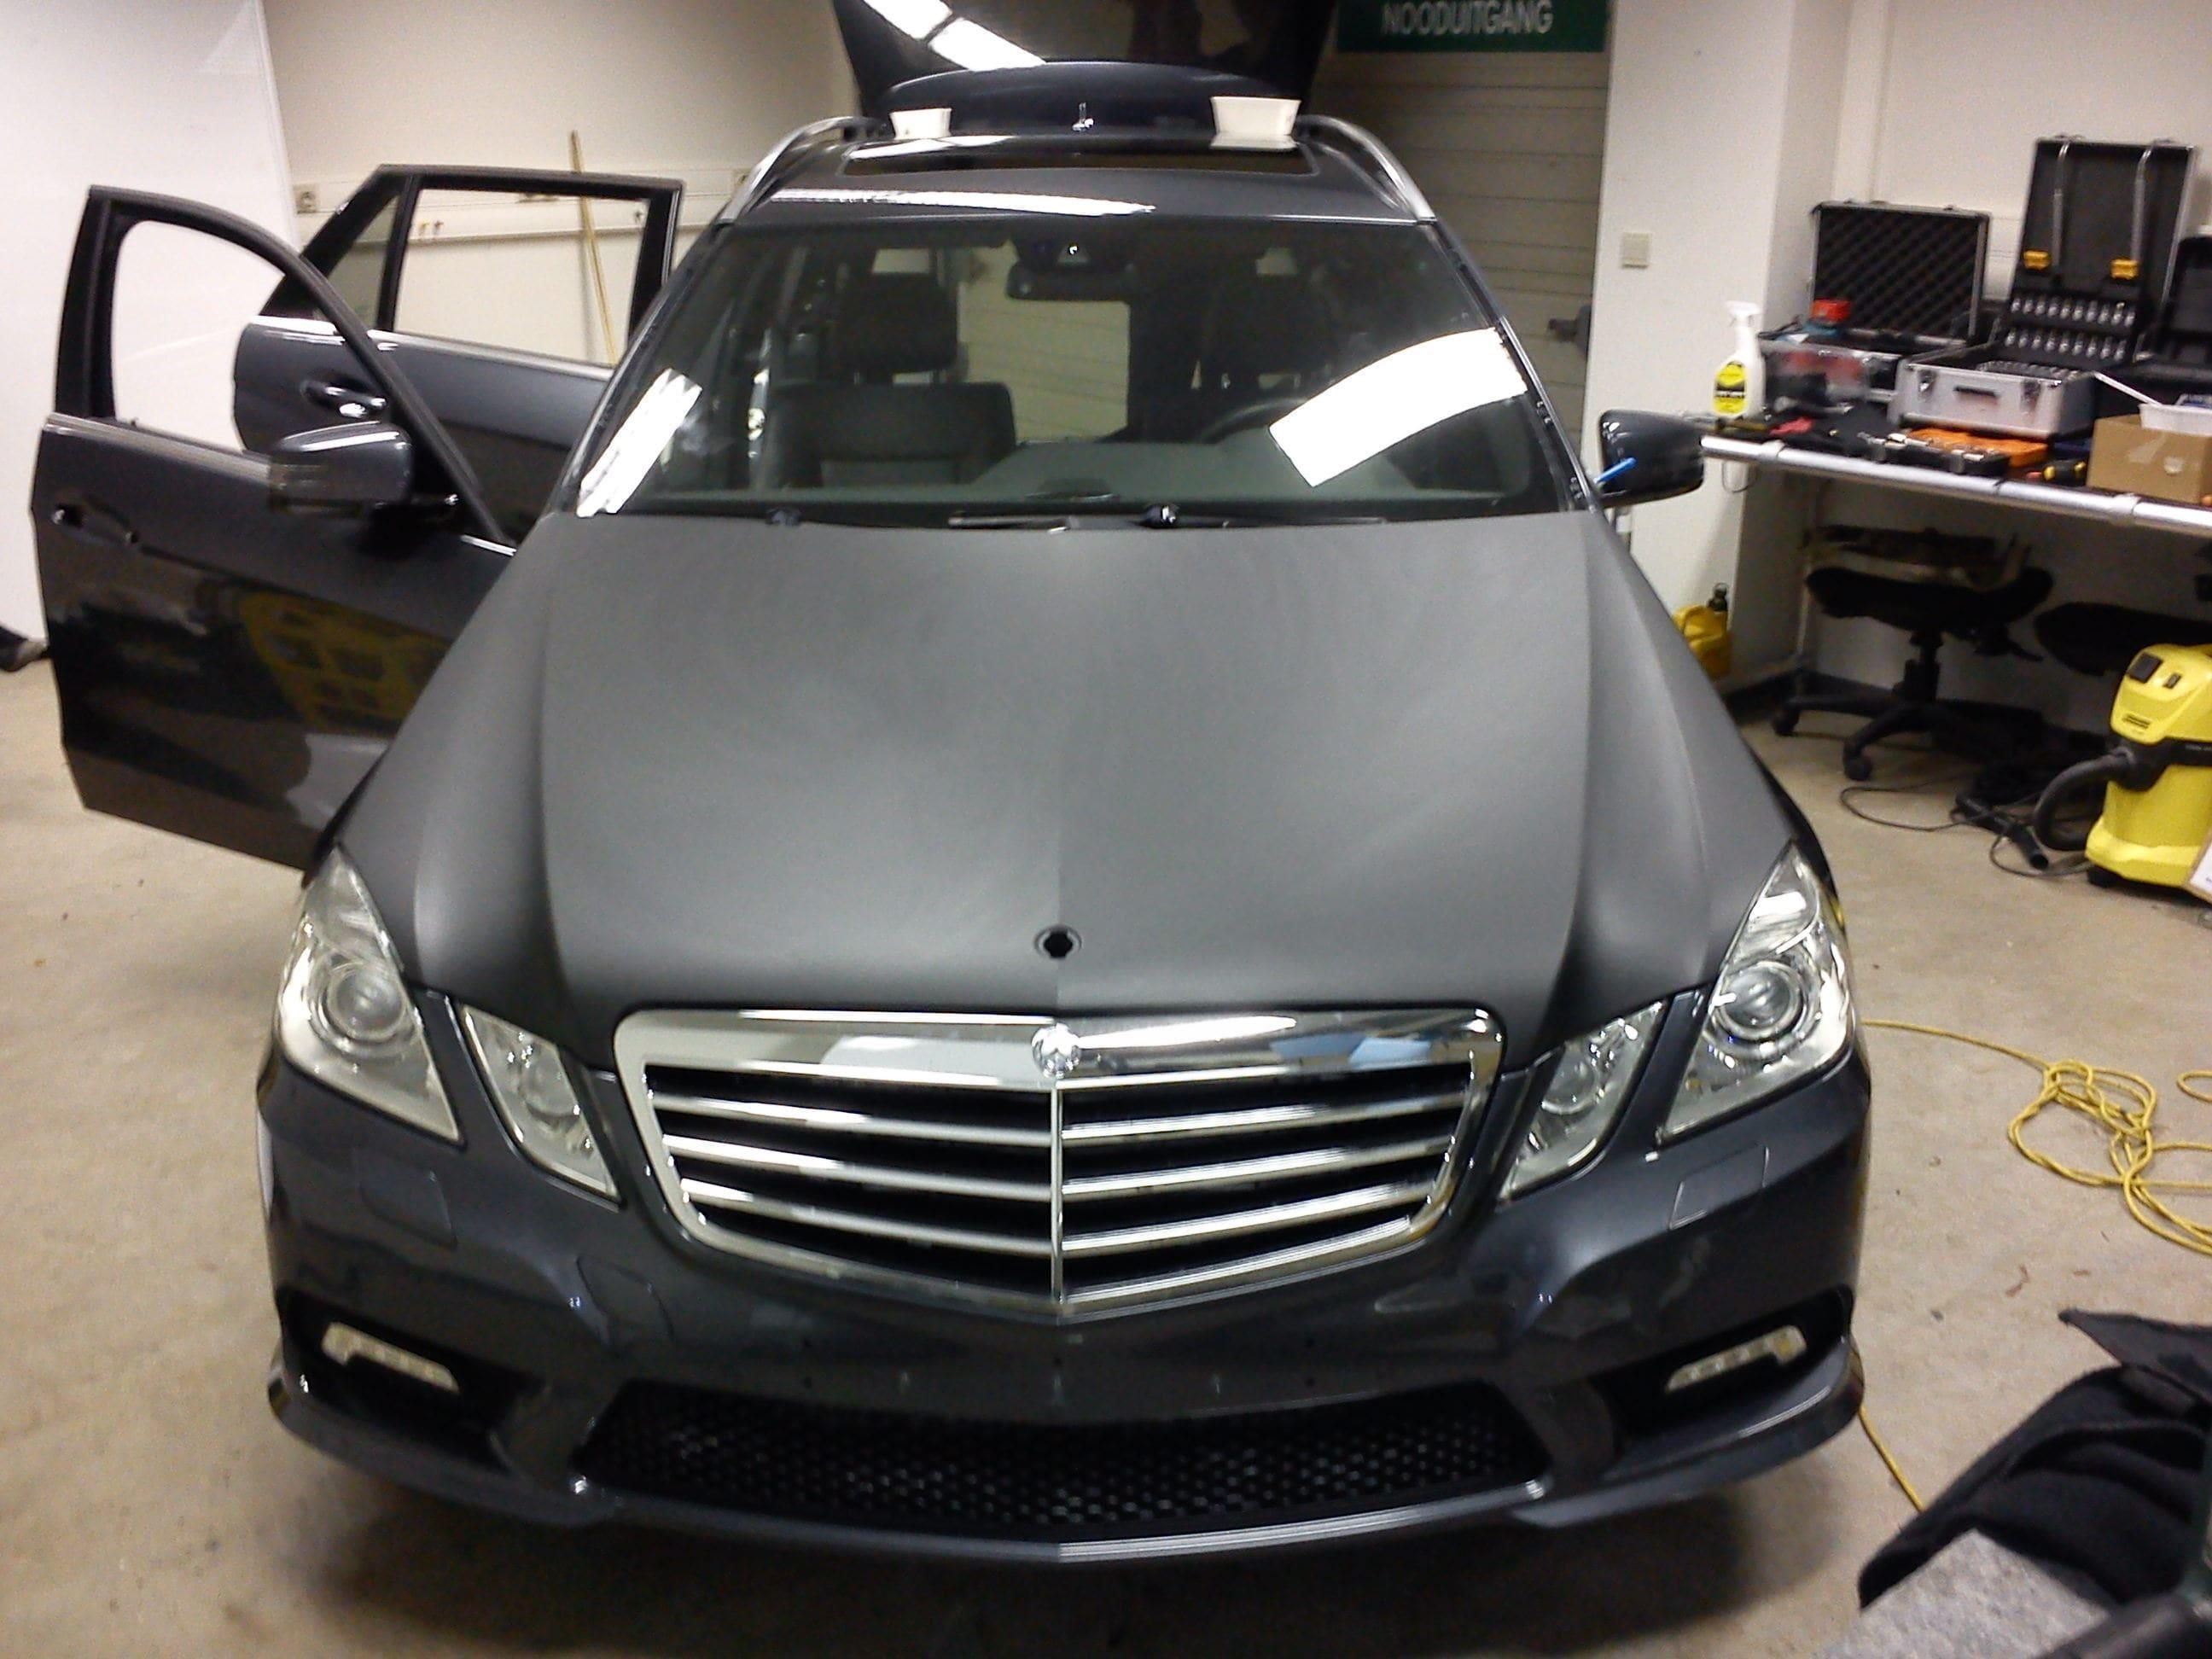 Mercedes E320 met Mat Zwarte Wrap, Carwrapping door Wrapmyride.nu Foto-nr:6224, ©2020